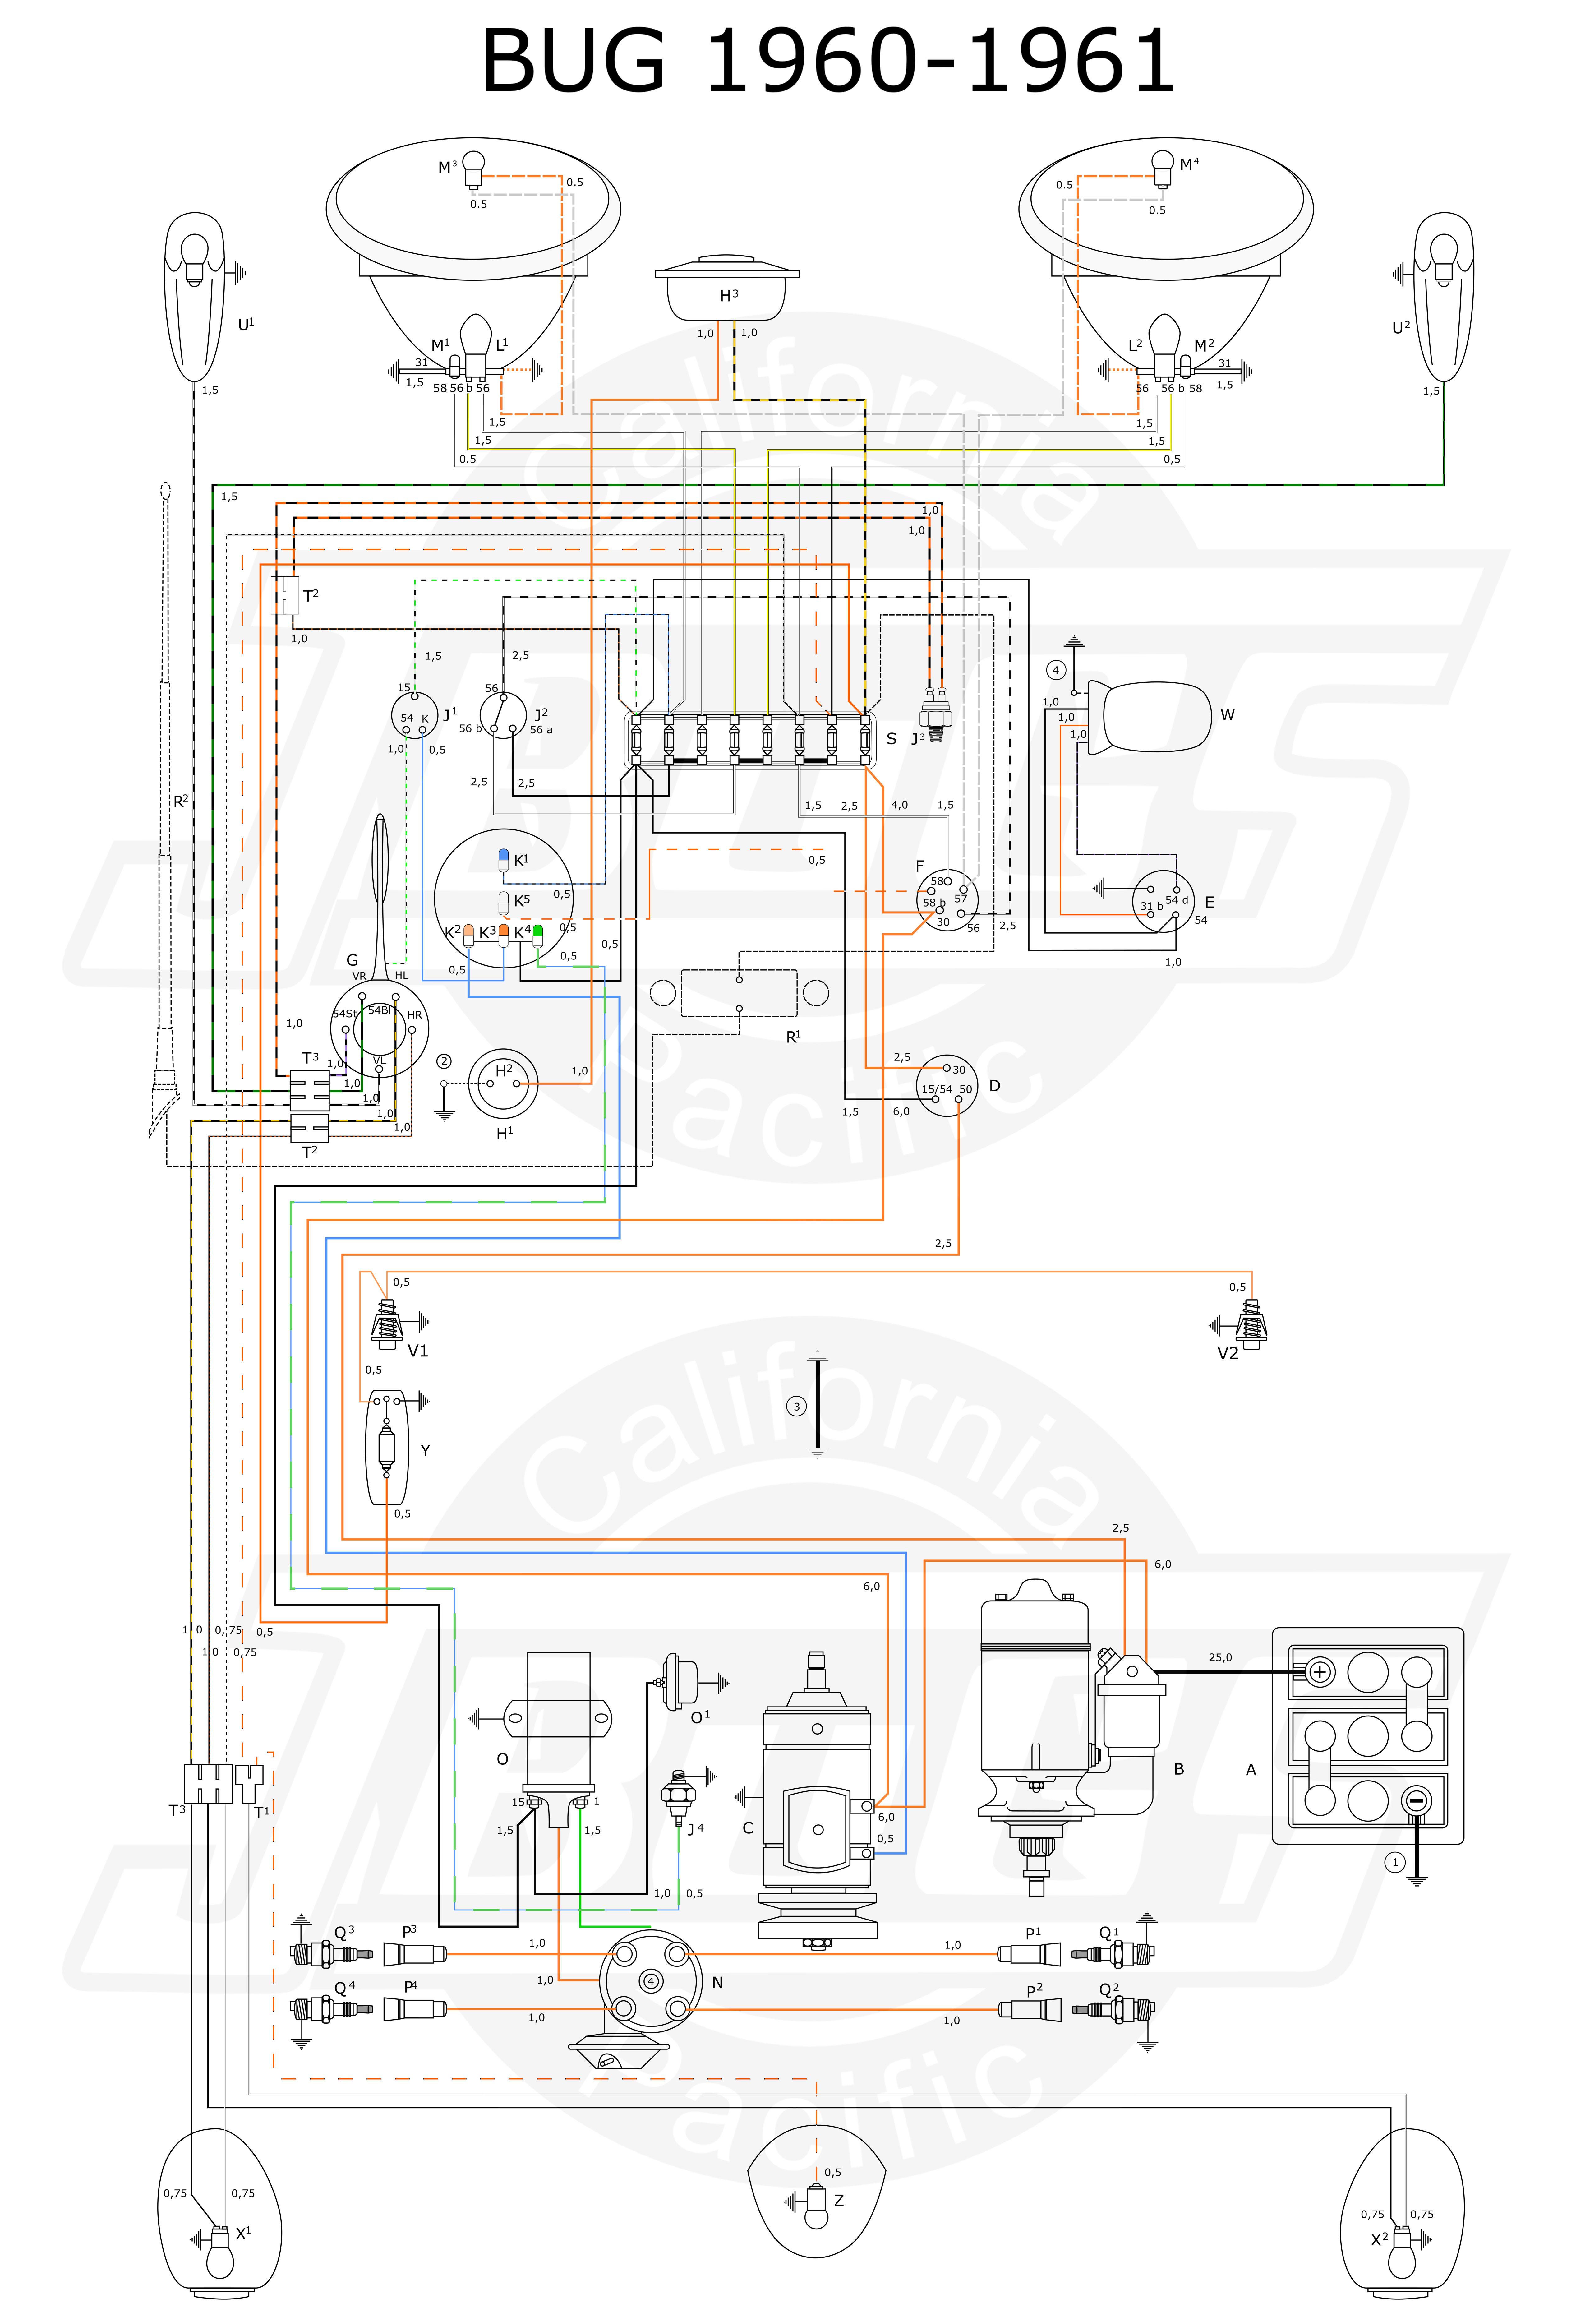 99b4 89 Dodge Ram Wiring Diagram Wiring Library